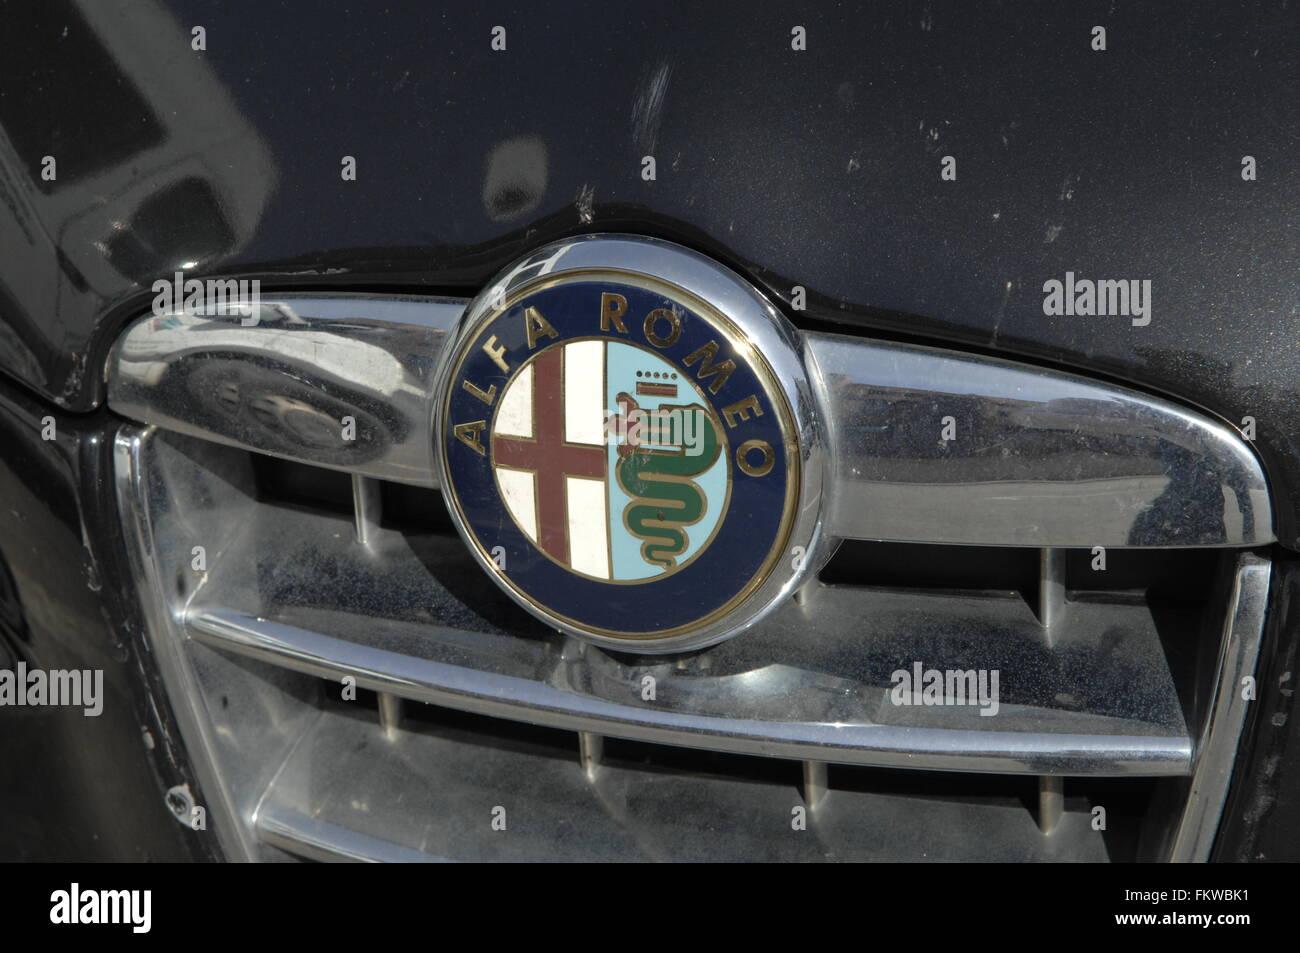 "Alfa Romeo Automobiles s.p.a. ist ein italienischer Automobilhersteller. Als Tiefzeiten (""Anonima Lombarda Fabbrica Automobili"" gegründet Stockfoto"